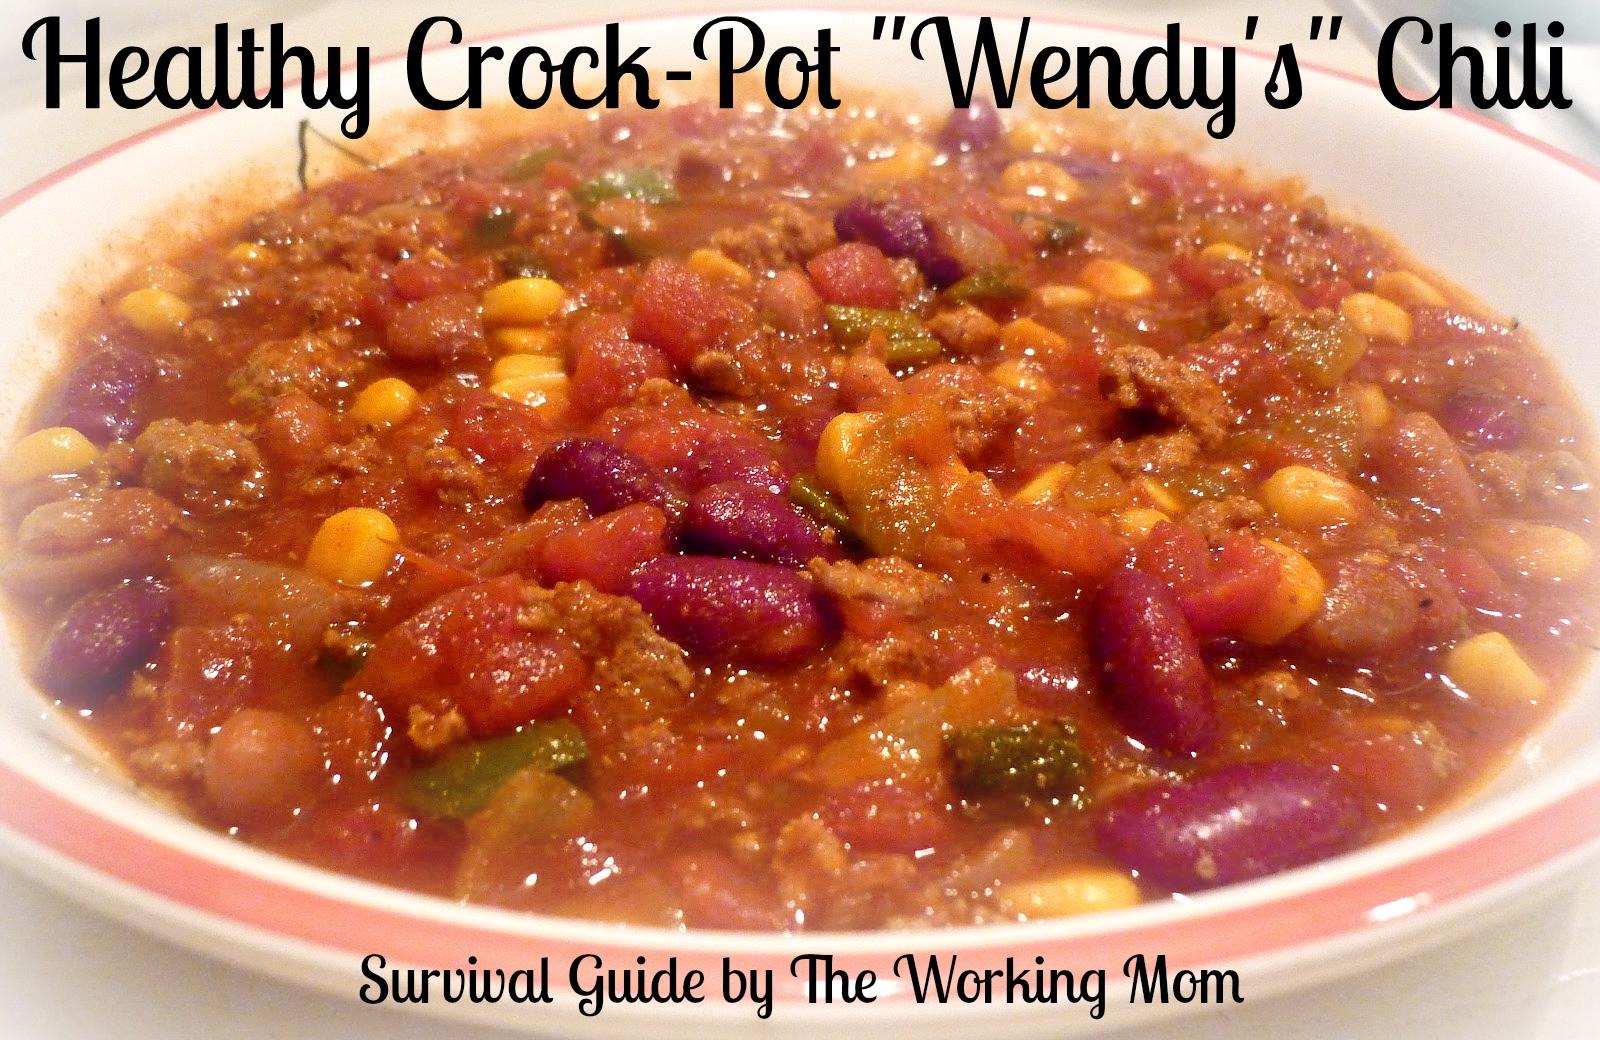 Healthy Turkey Chili Crockpot  Healthy Crockpot Wendy s Chili Recipe